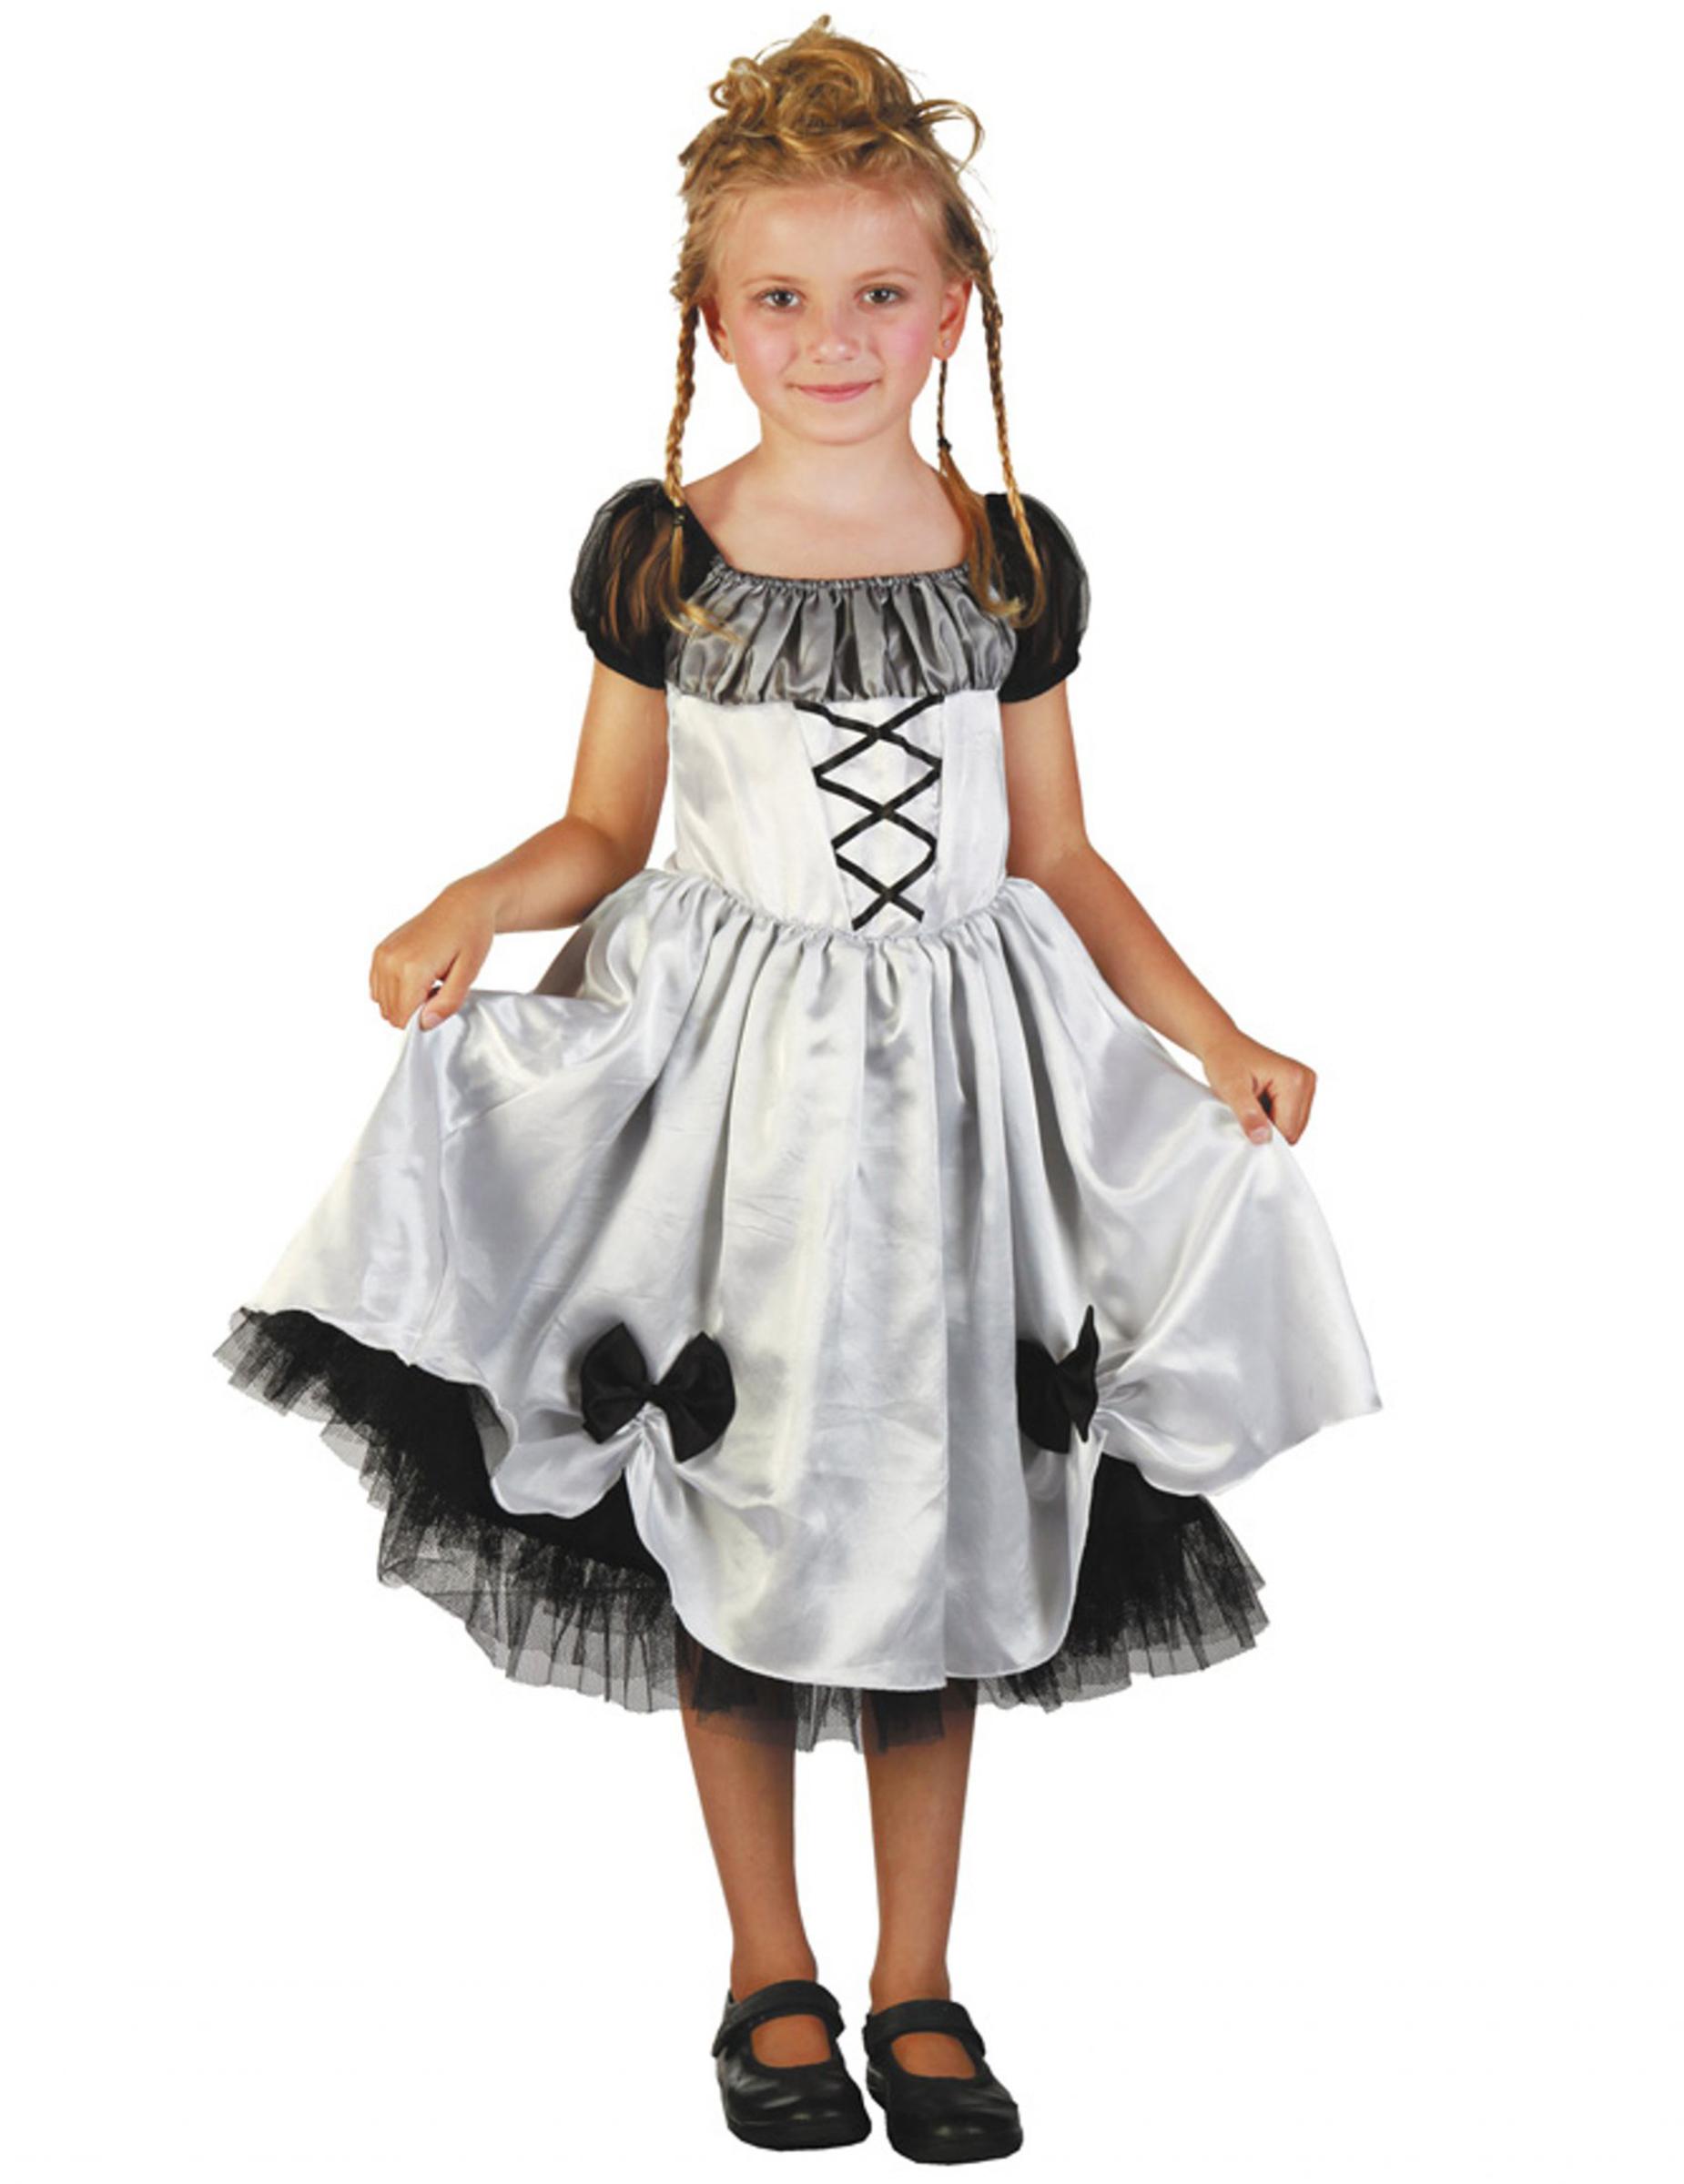 Costume sposa bianco e nero bambina halloween: Costumi ...